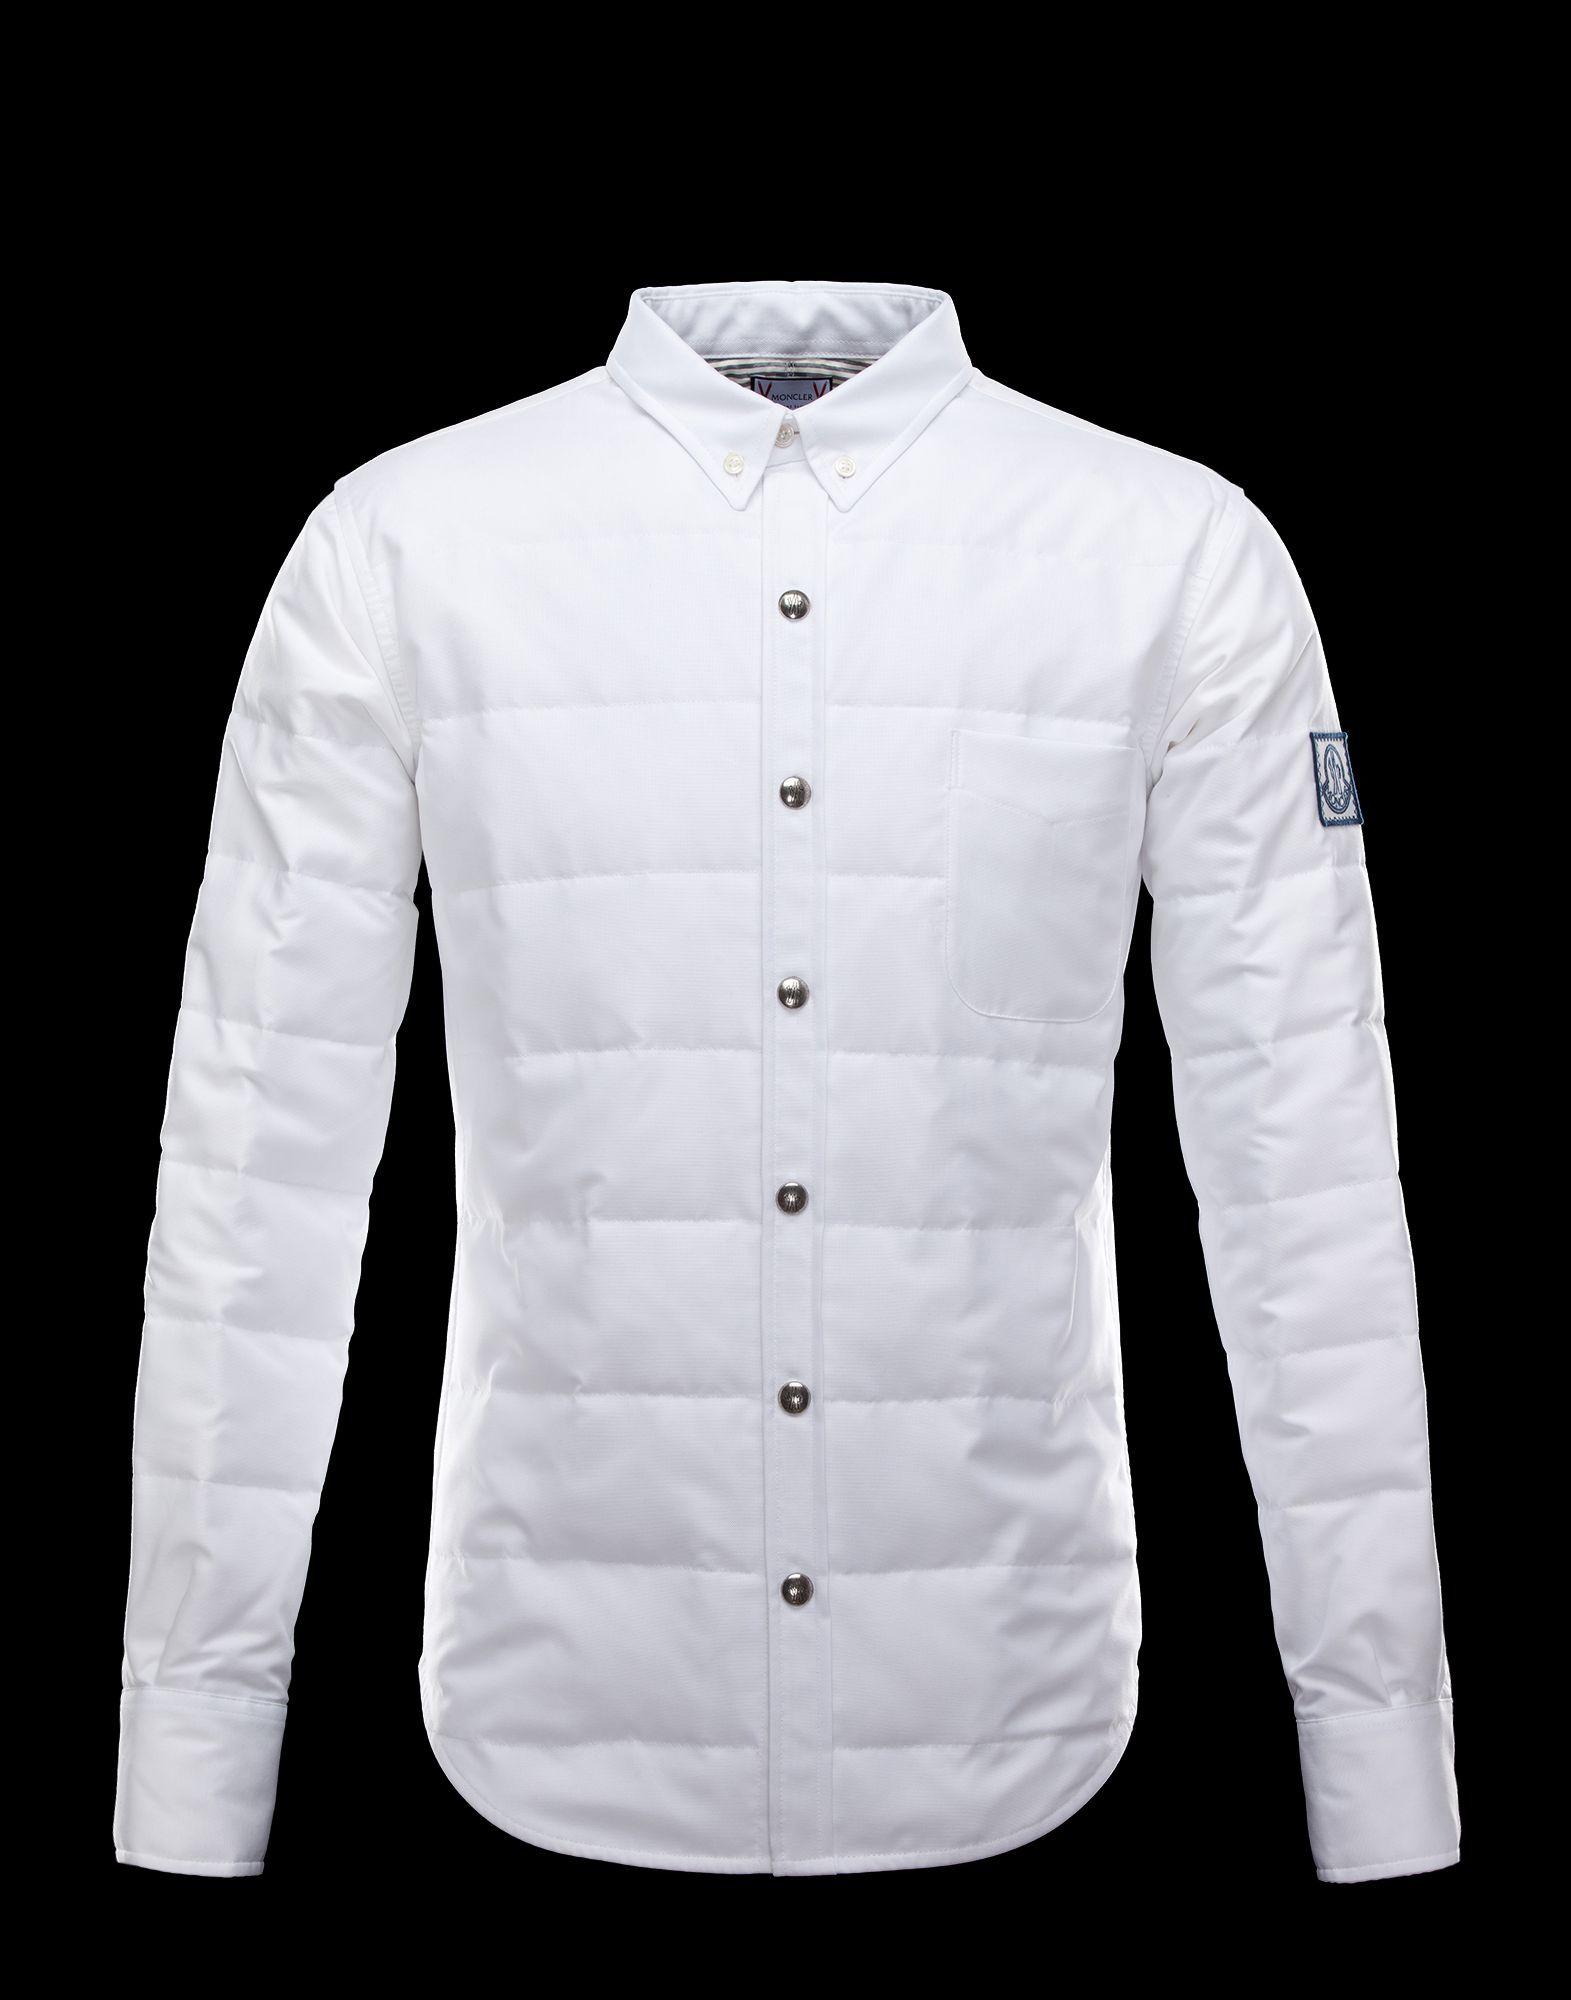 MONCLER GAMME BLEU Men - Fall/Winter 12 - SHIRTS - Long sleeve shirt -